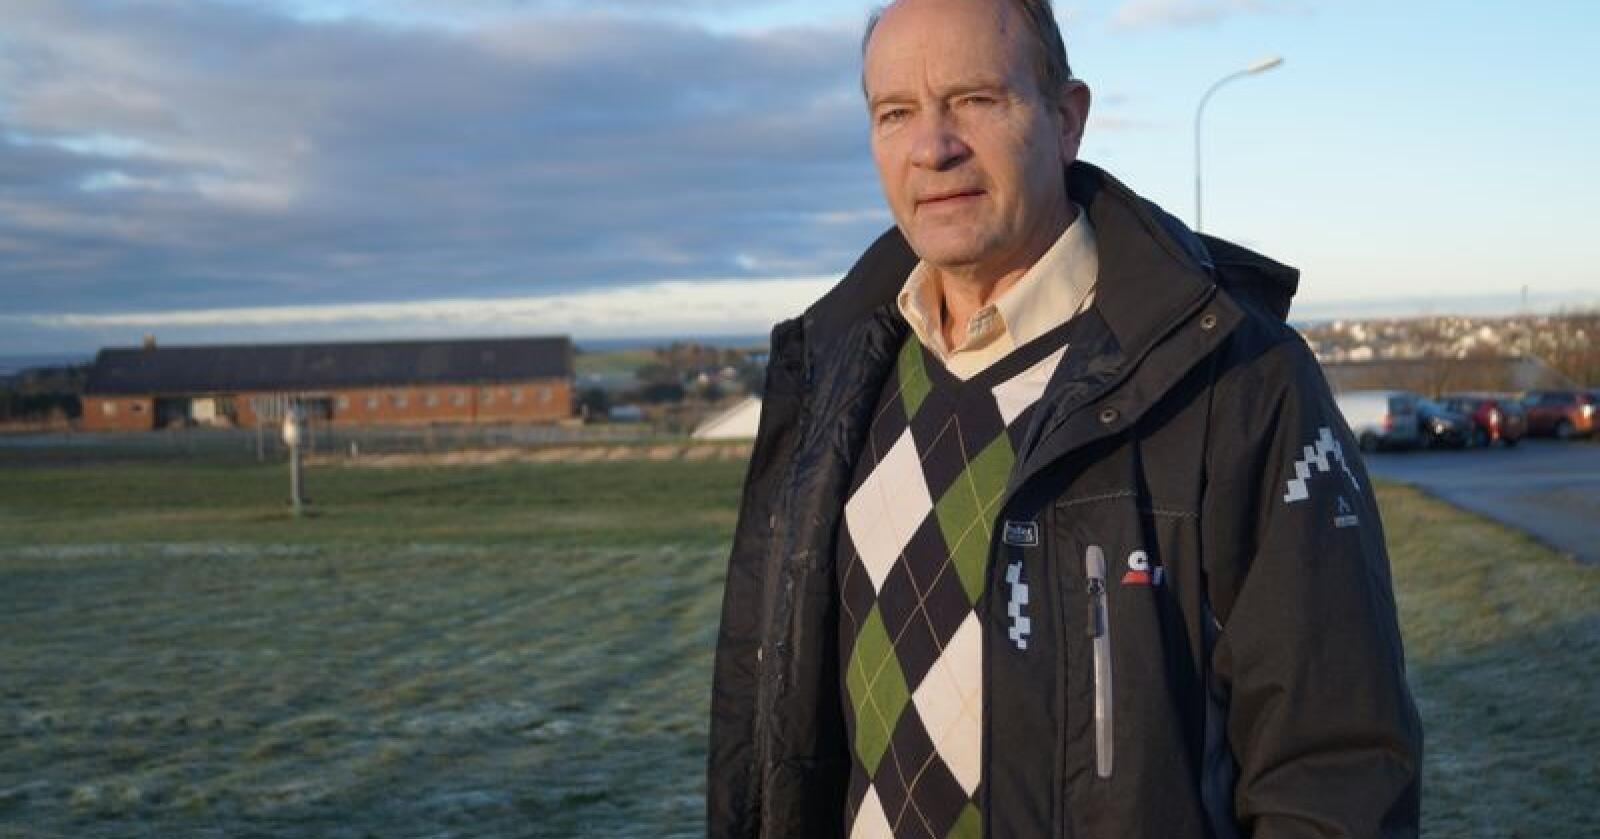 Leder Olaf Gjedrem i Jordvernforeningen i Rogaland. (Foto: Sjur Håland/ Bondevennen)